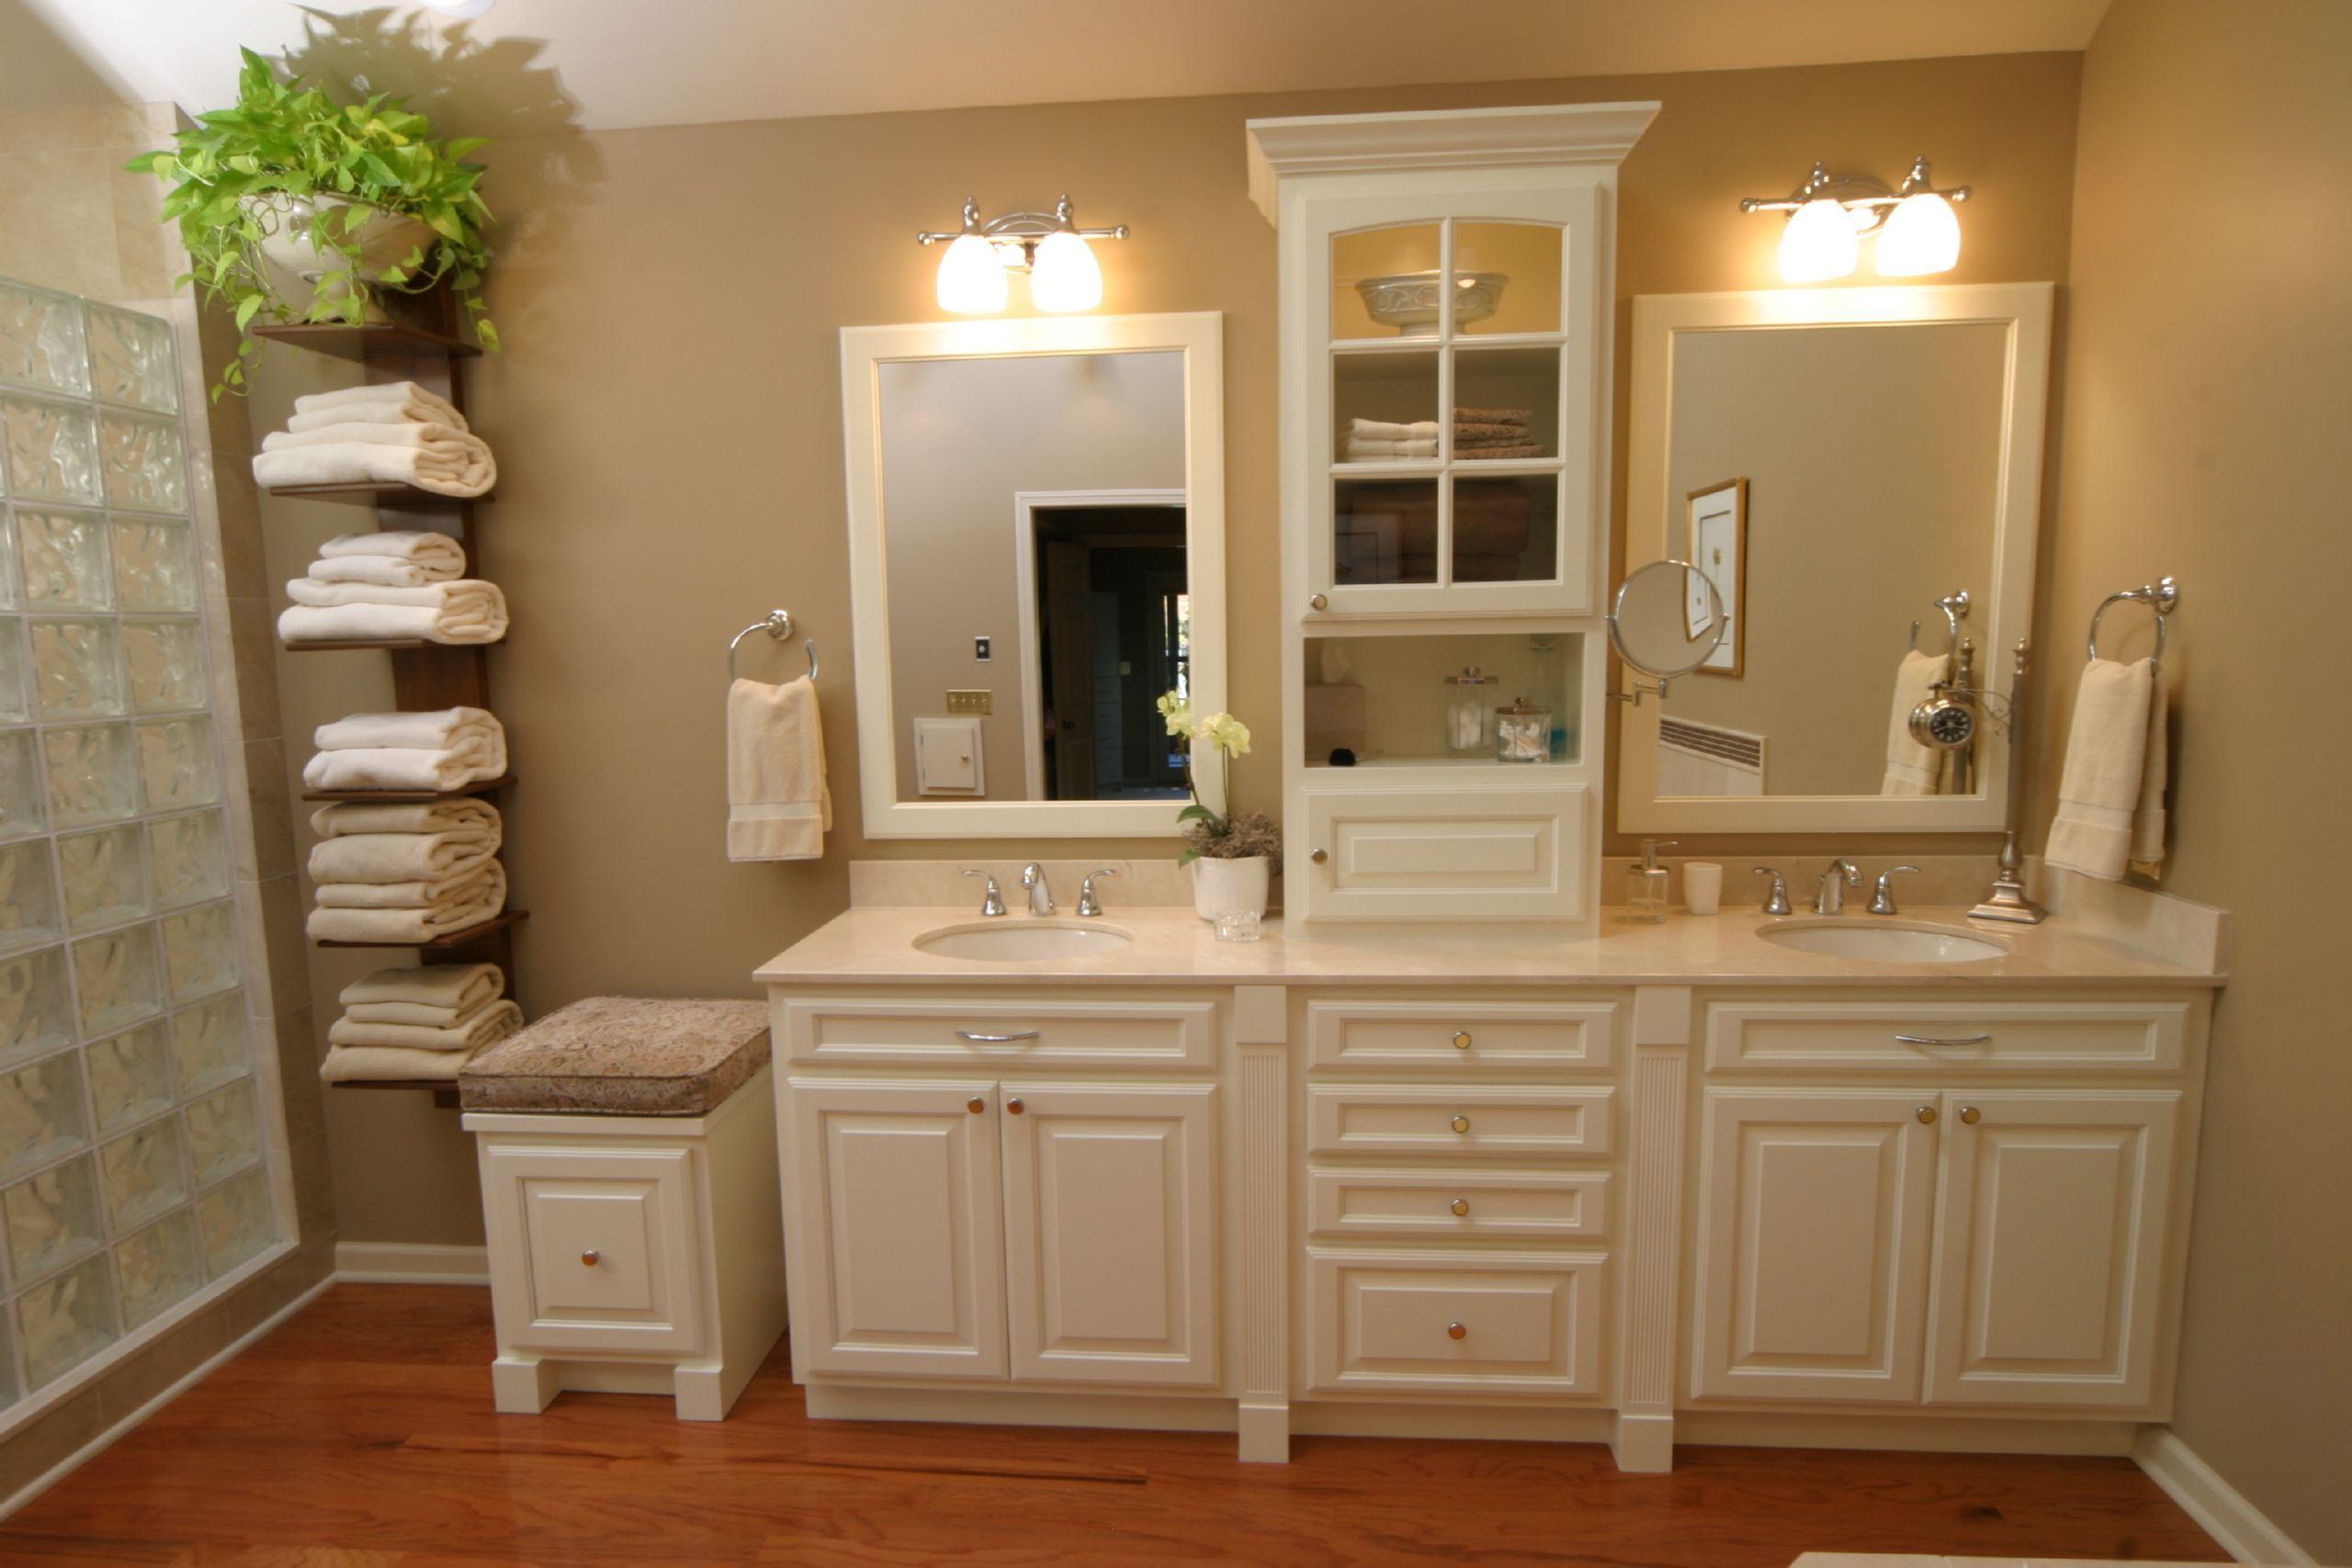 Distinguished Diy Bathroom Counter Storage Bathroom Counter within size 2560 X 1707